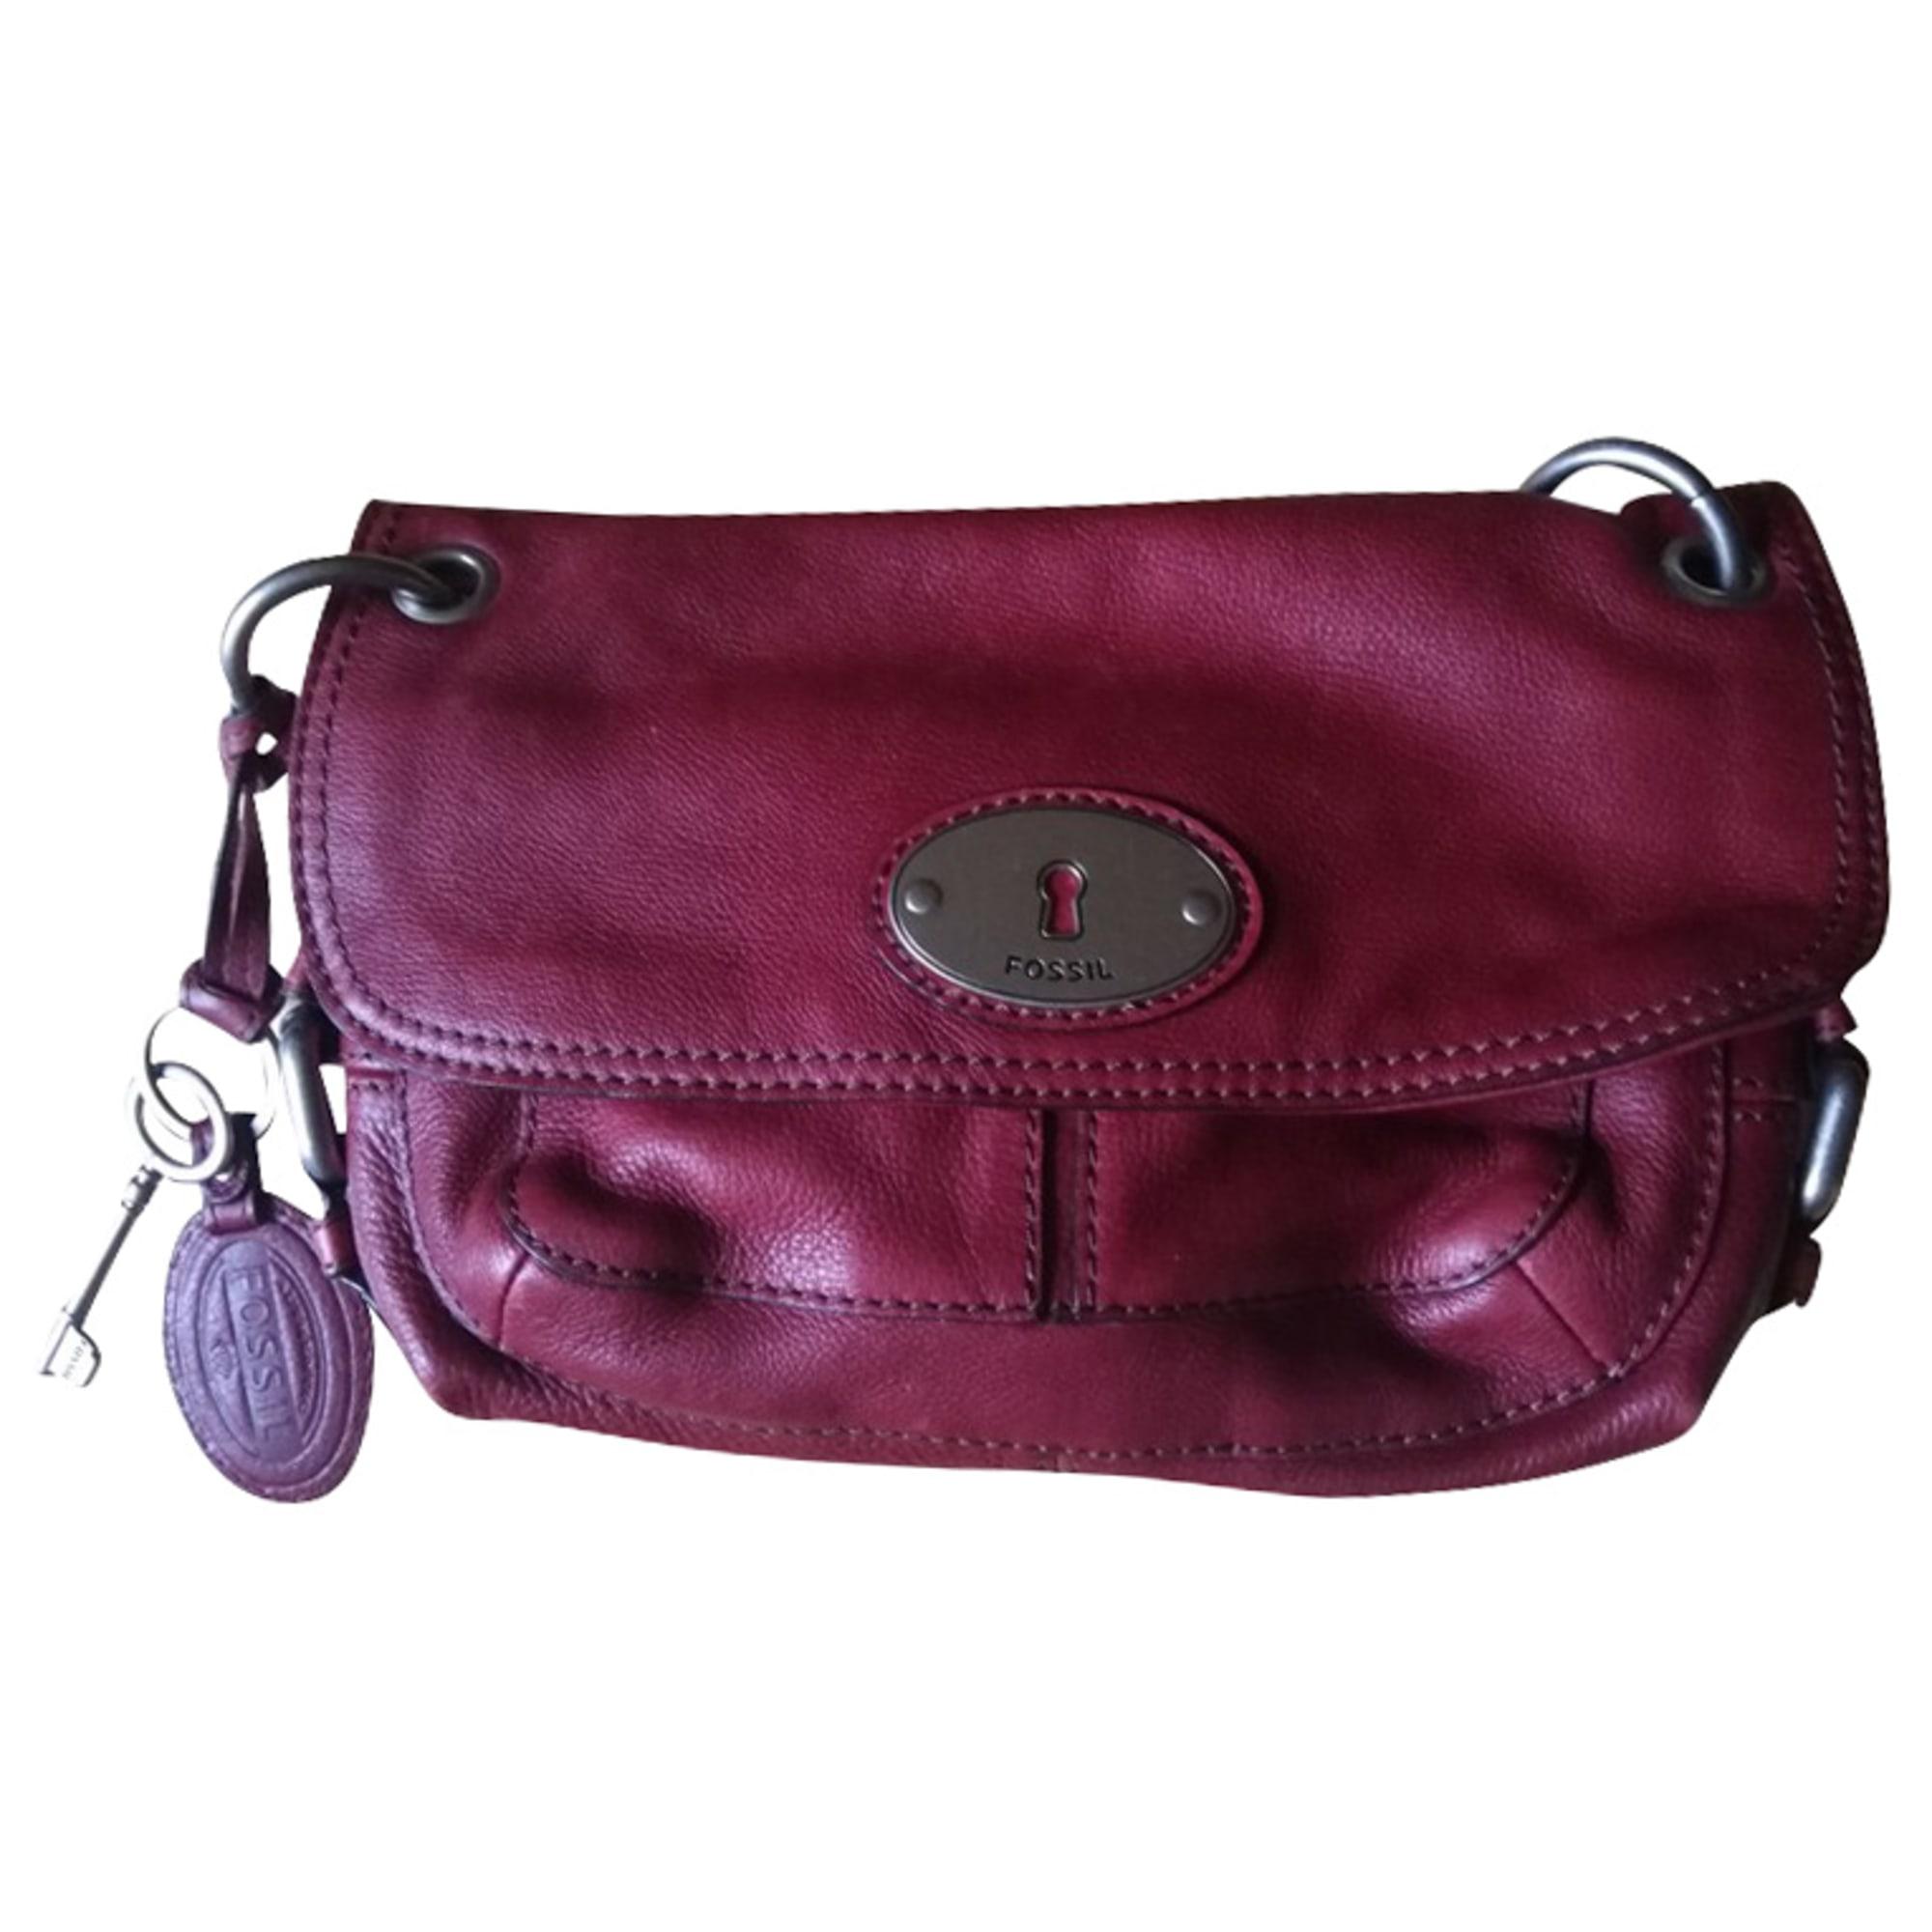 Lederhandtasche FOSSIL Rot, bordeauxrot